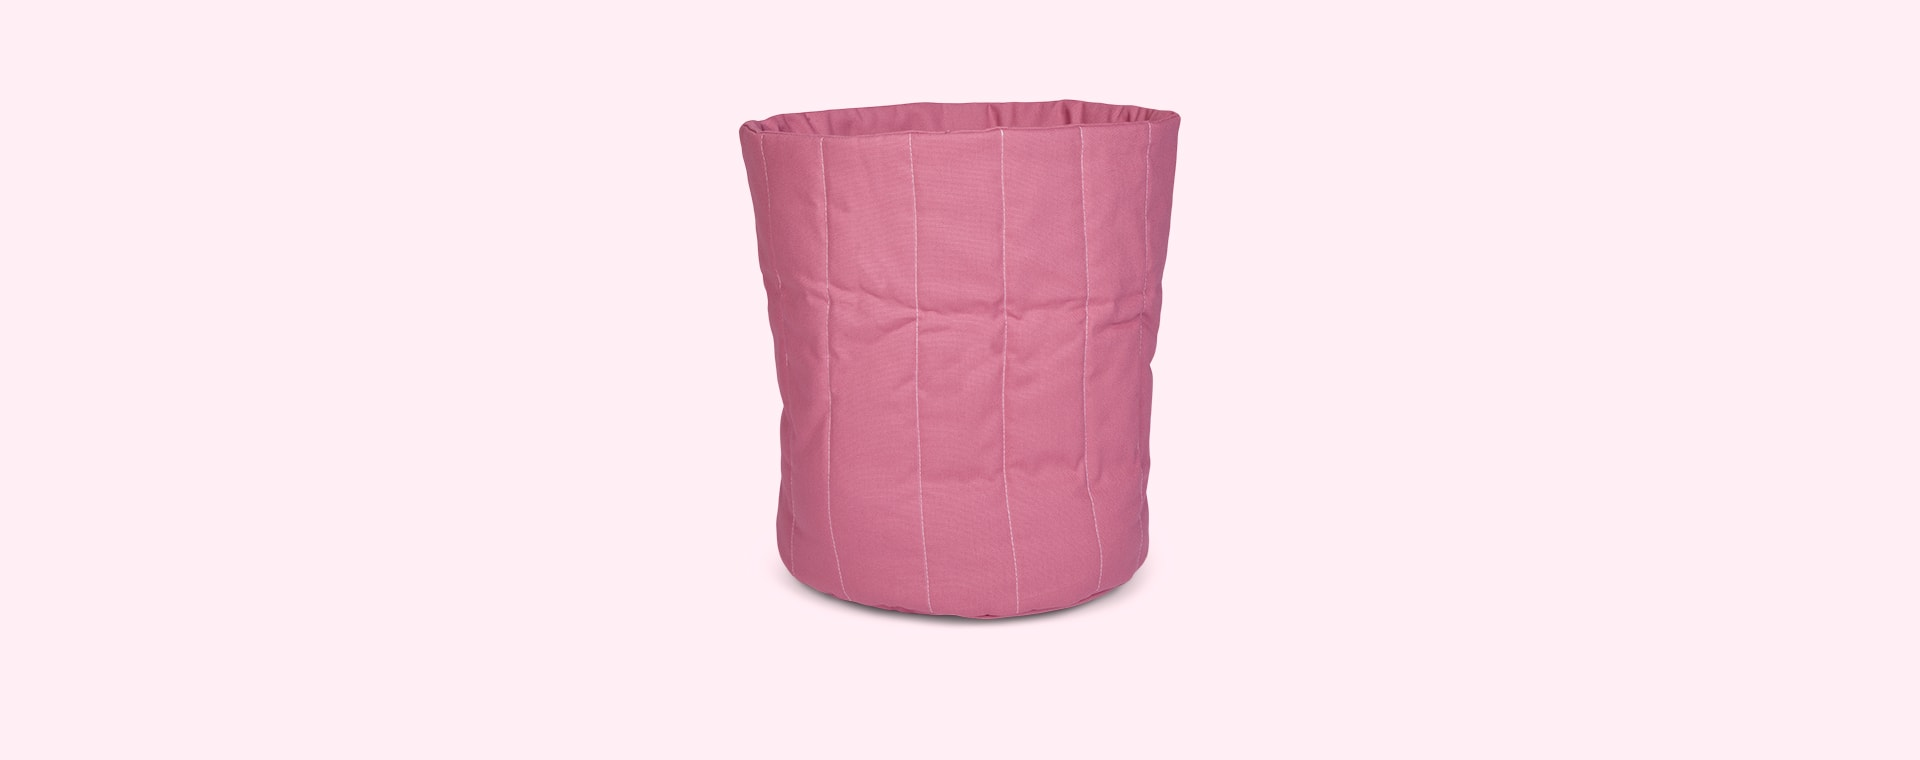 Blush Pink wigiwama Small Toy Storage Bag